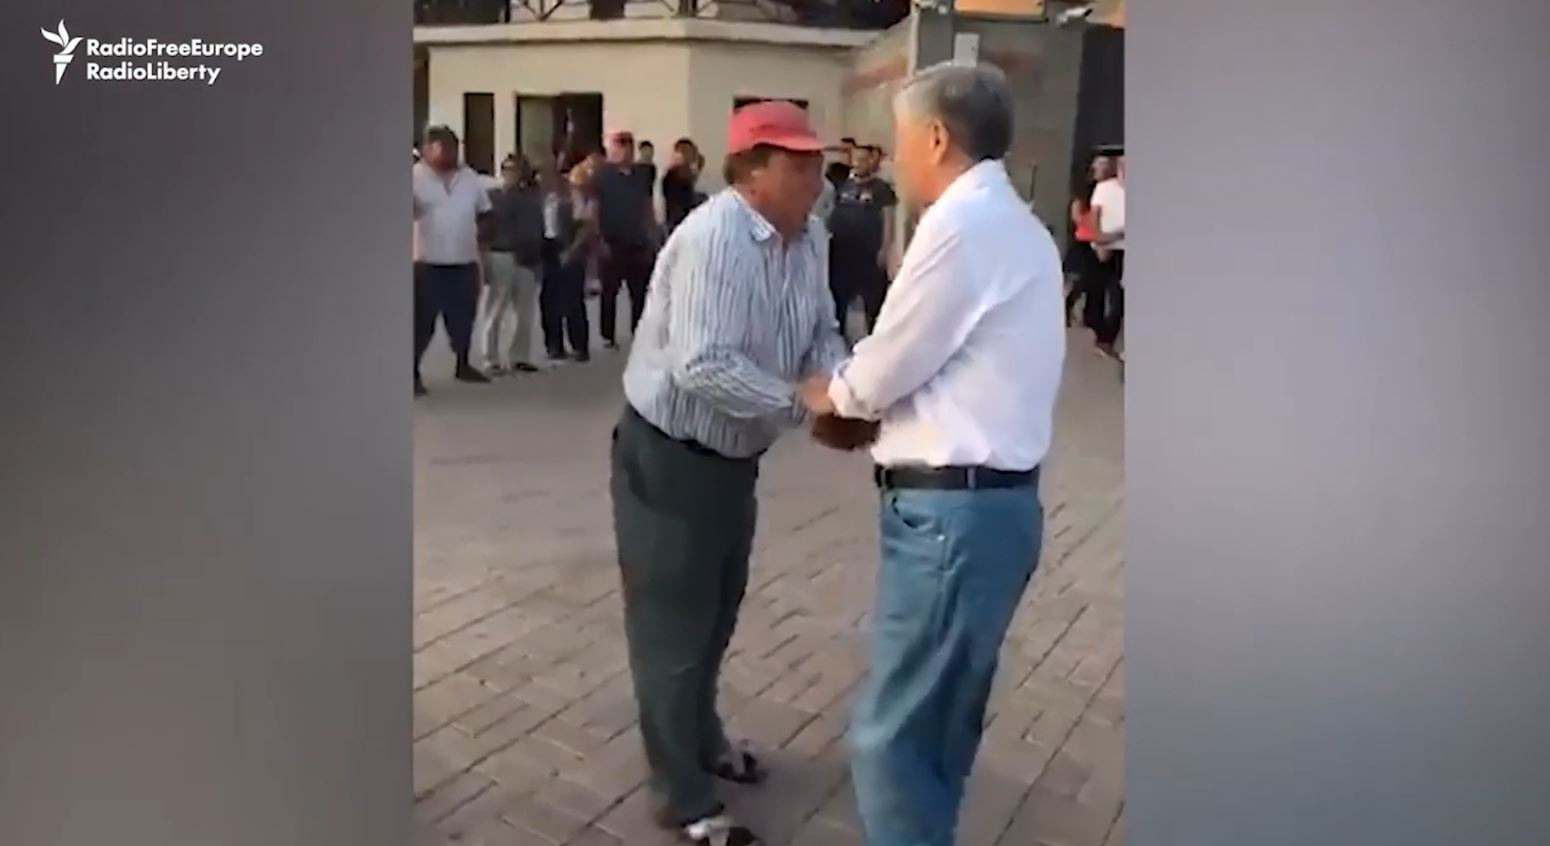 Arrestoeht ish-presidenti i Kirgistanit